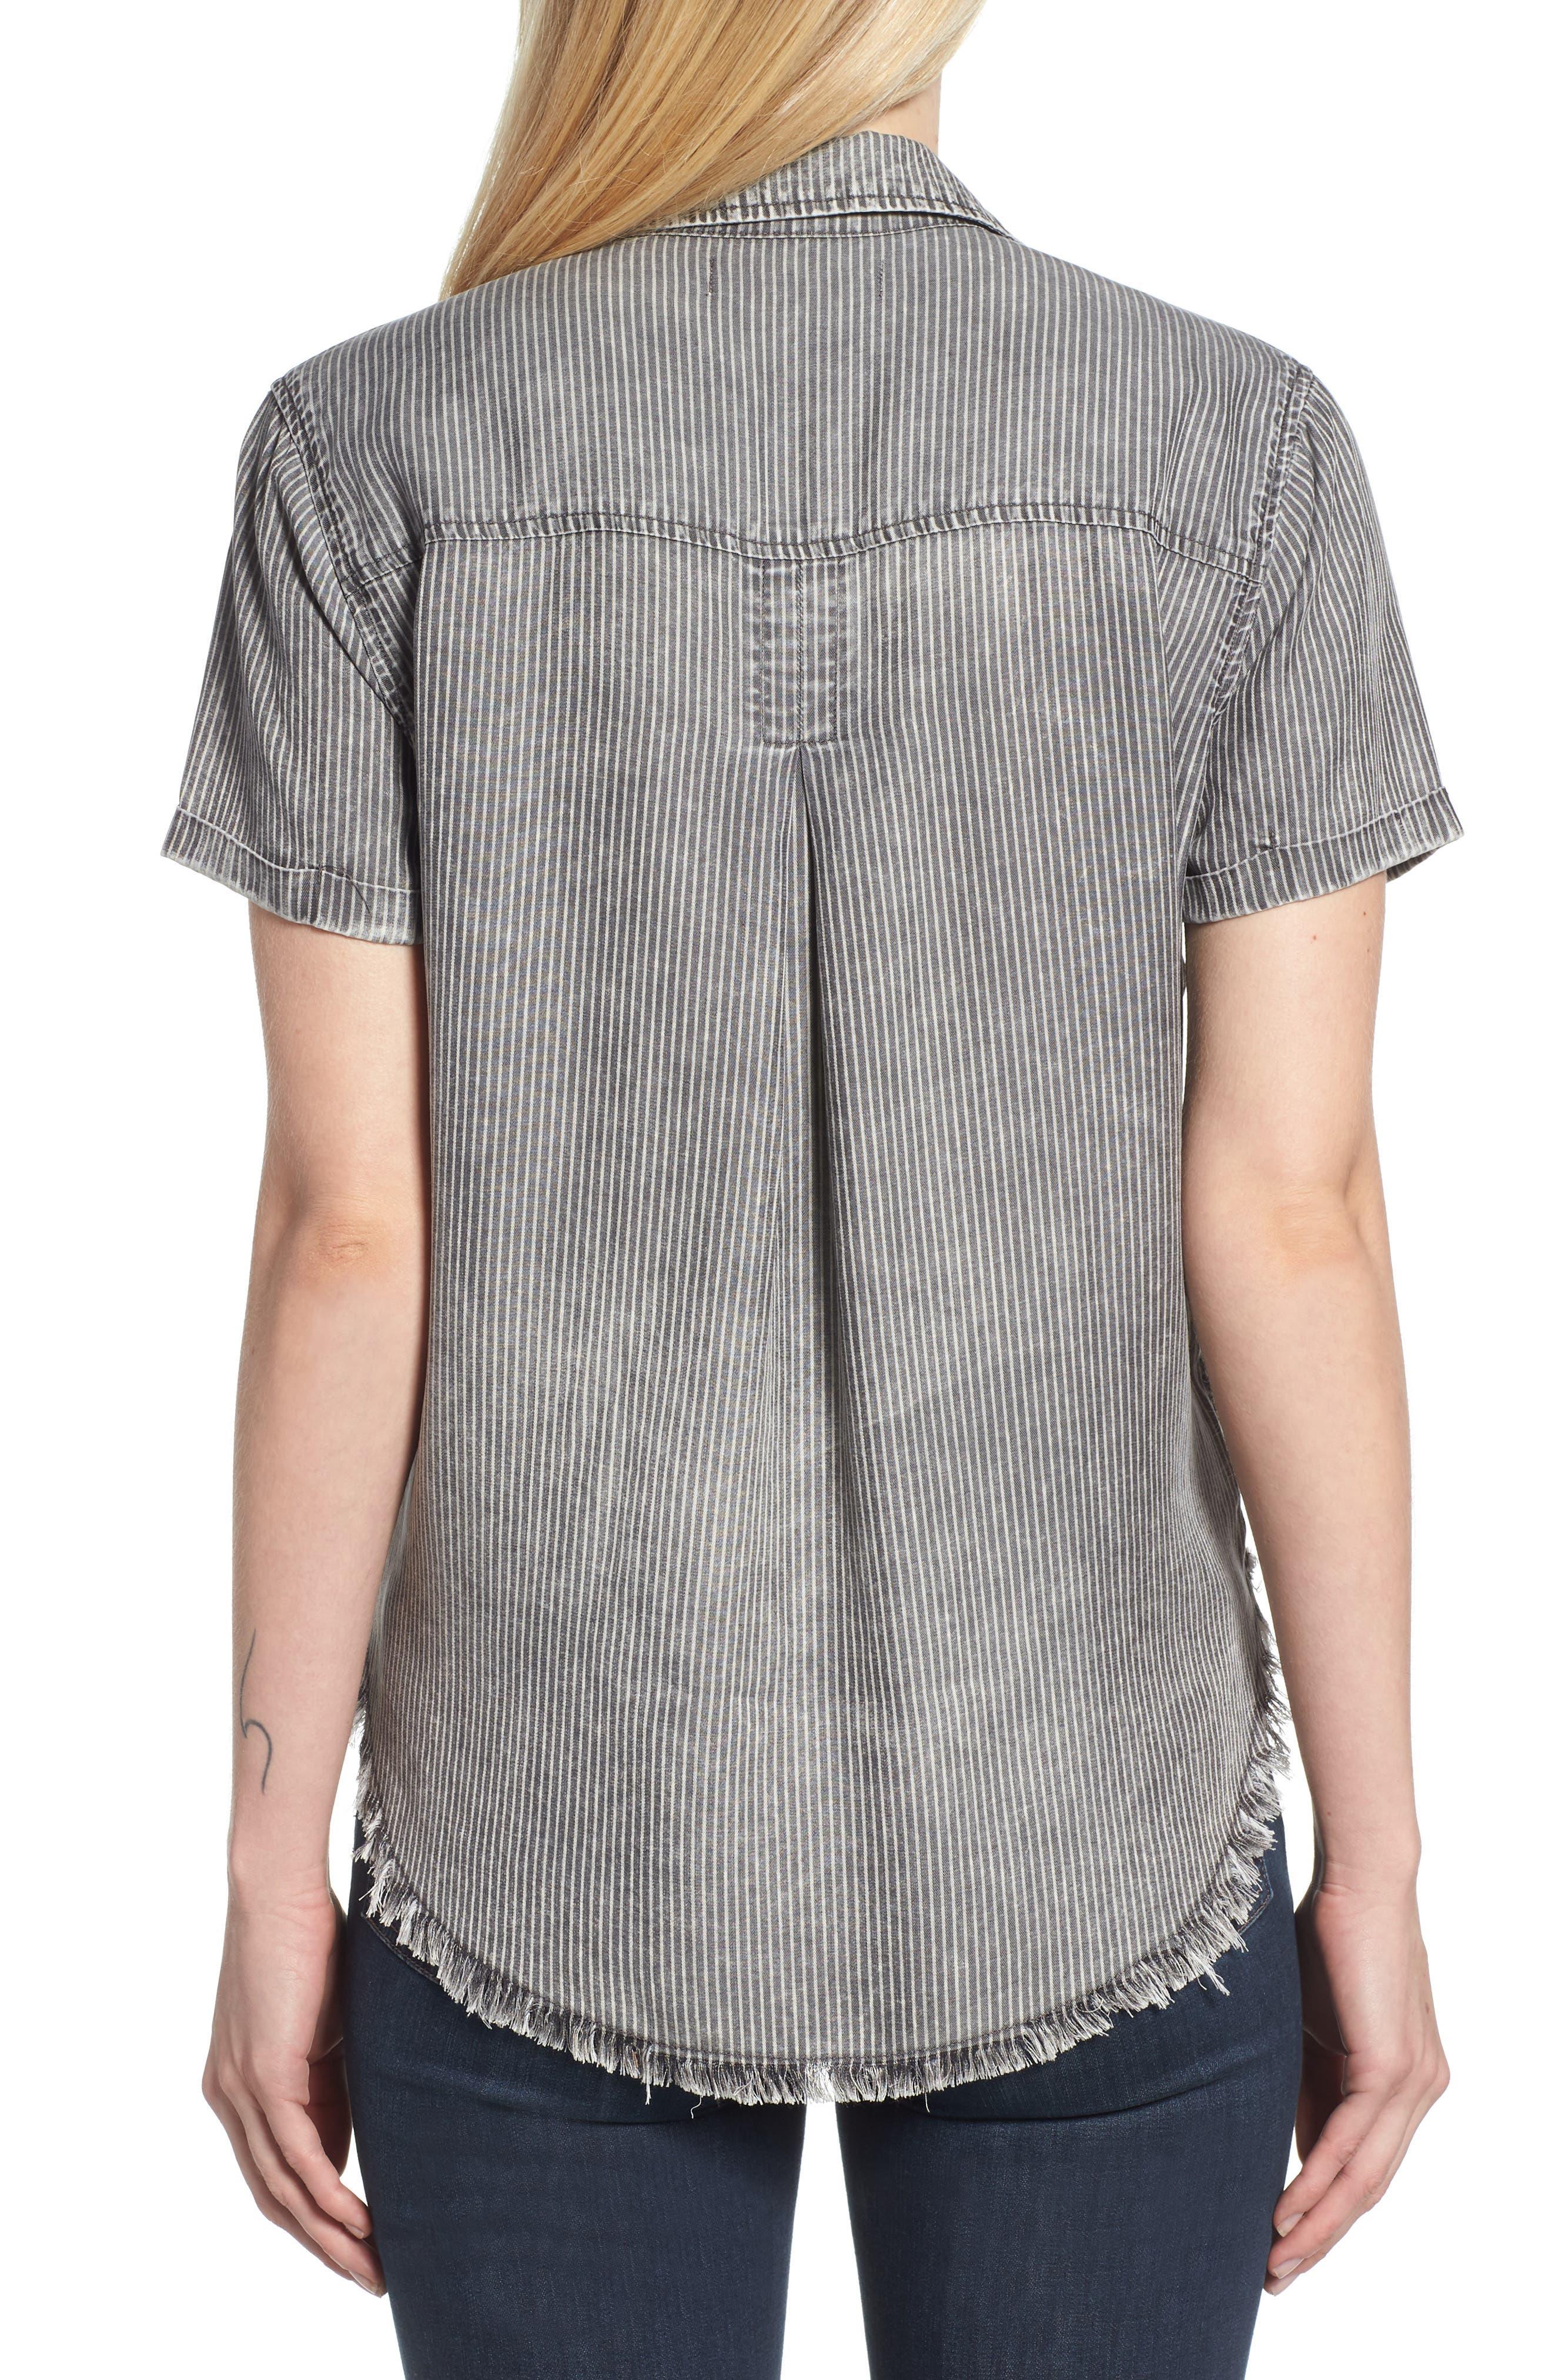 Ticking Stripe Shirt,                             Alternate thumbnail 2, color,                             Grey Rr